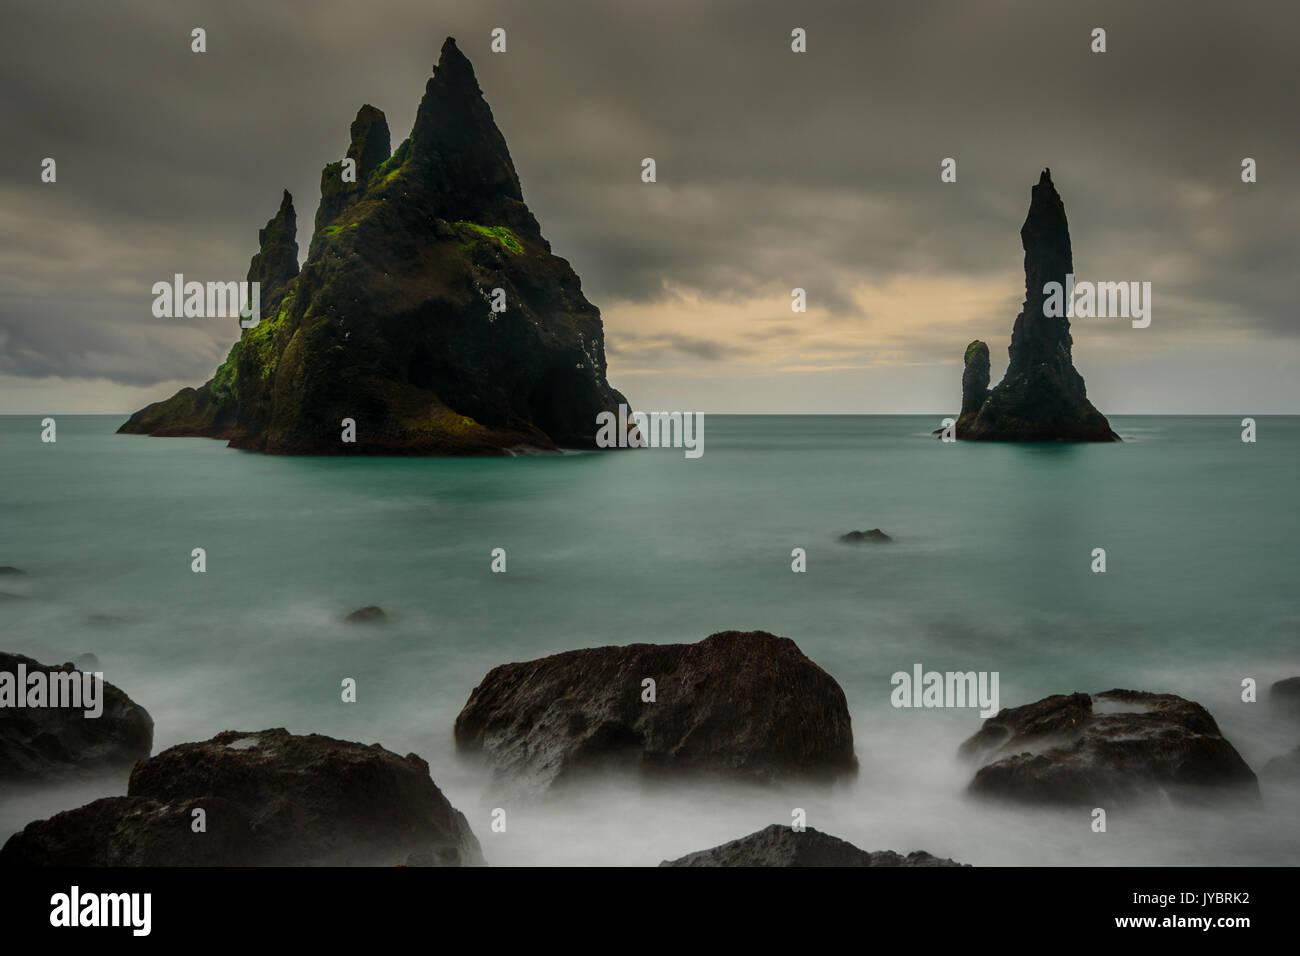 Basalt stacks of Reynisdrangar in a dark mood. - Stock Image